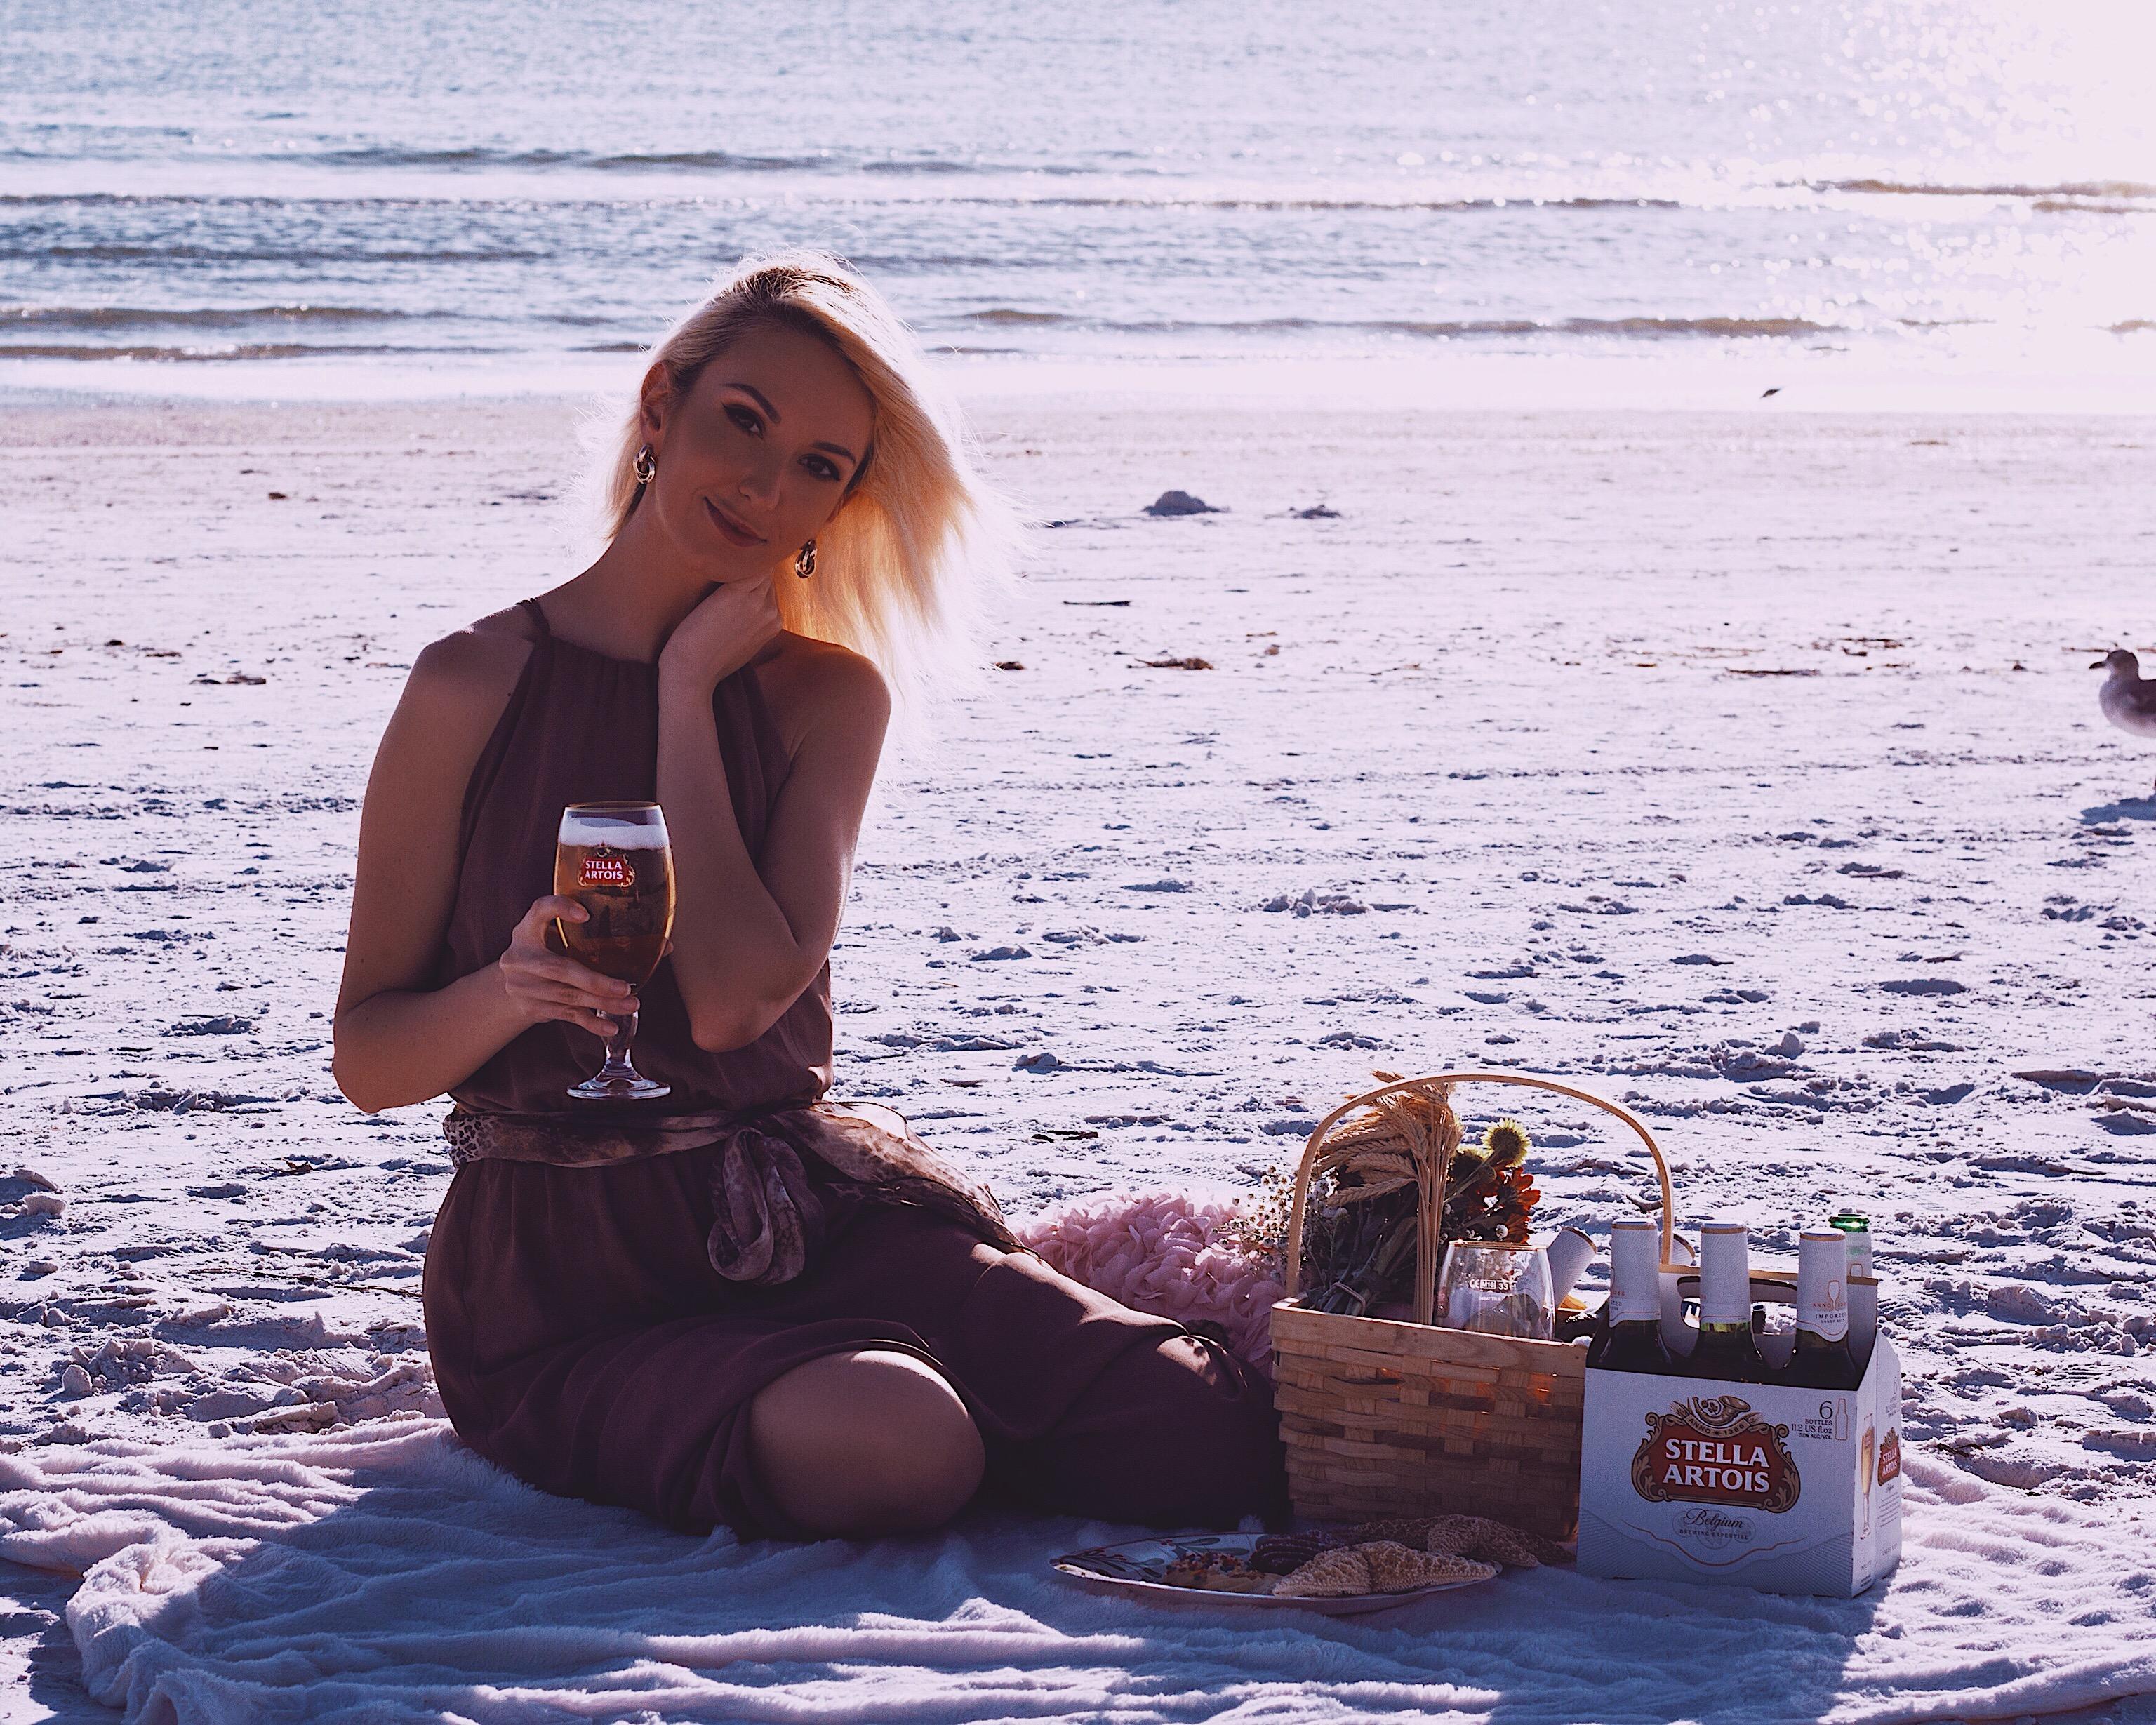 The perfect picnic with Stella Artois